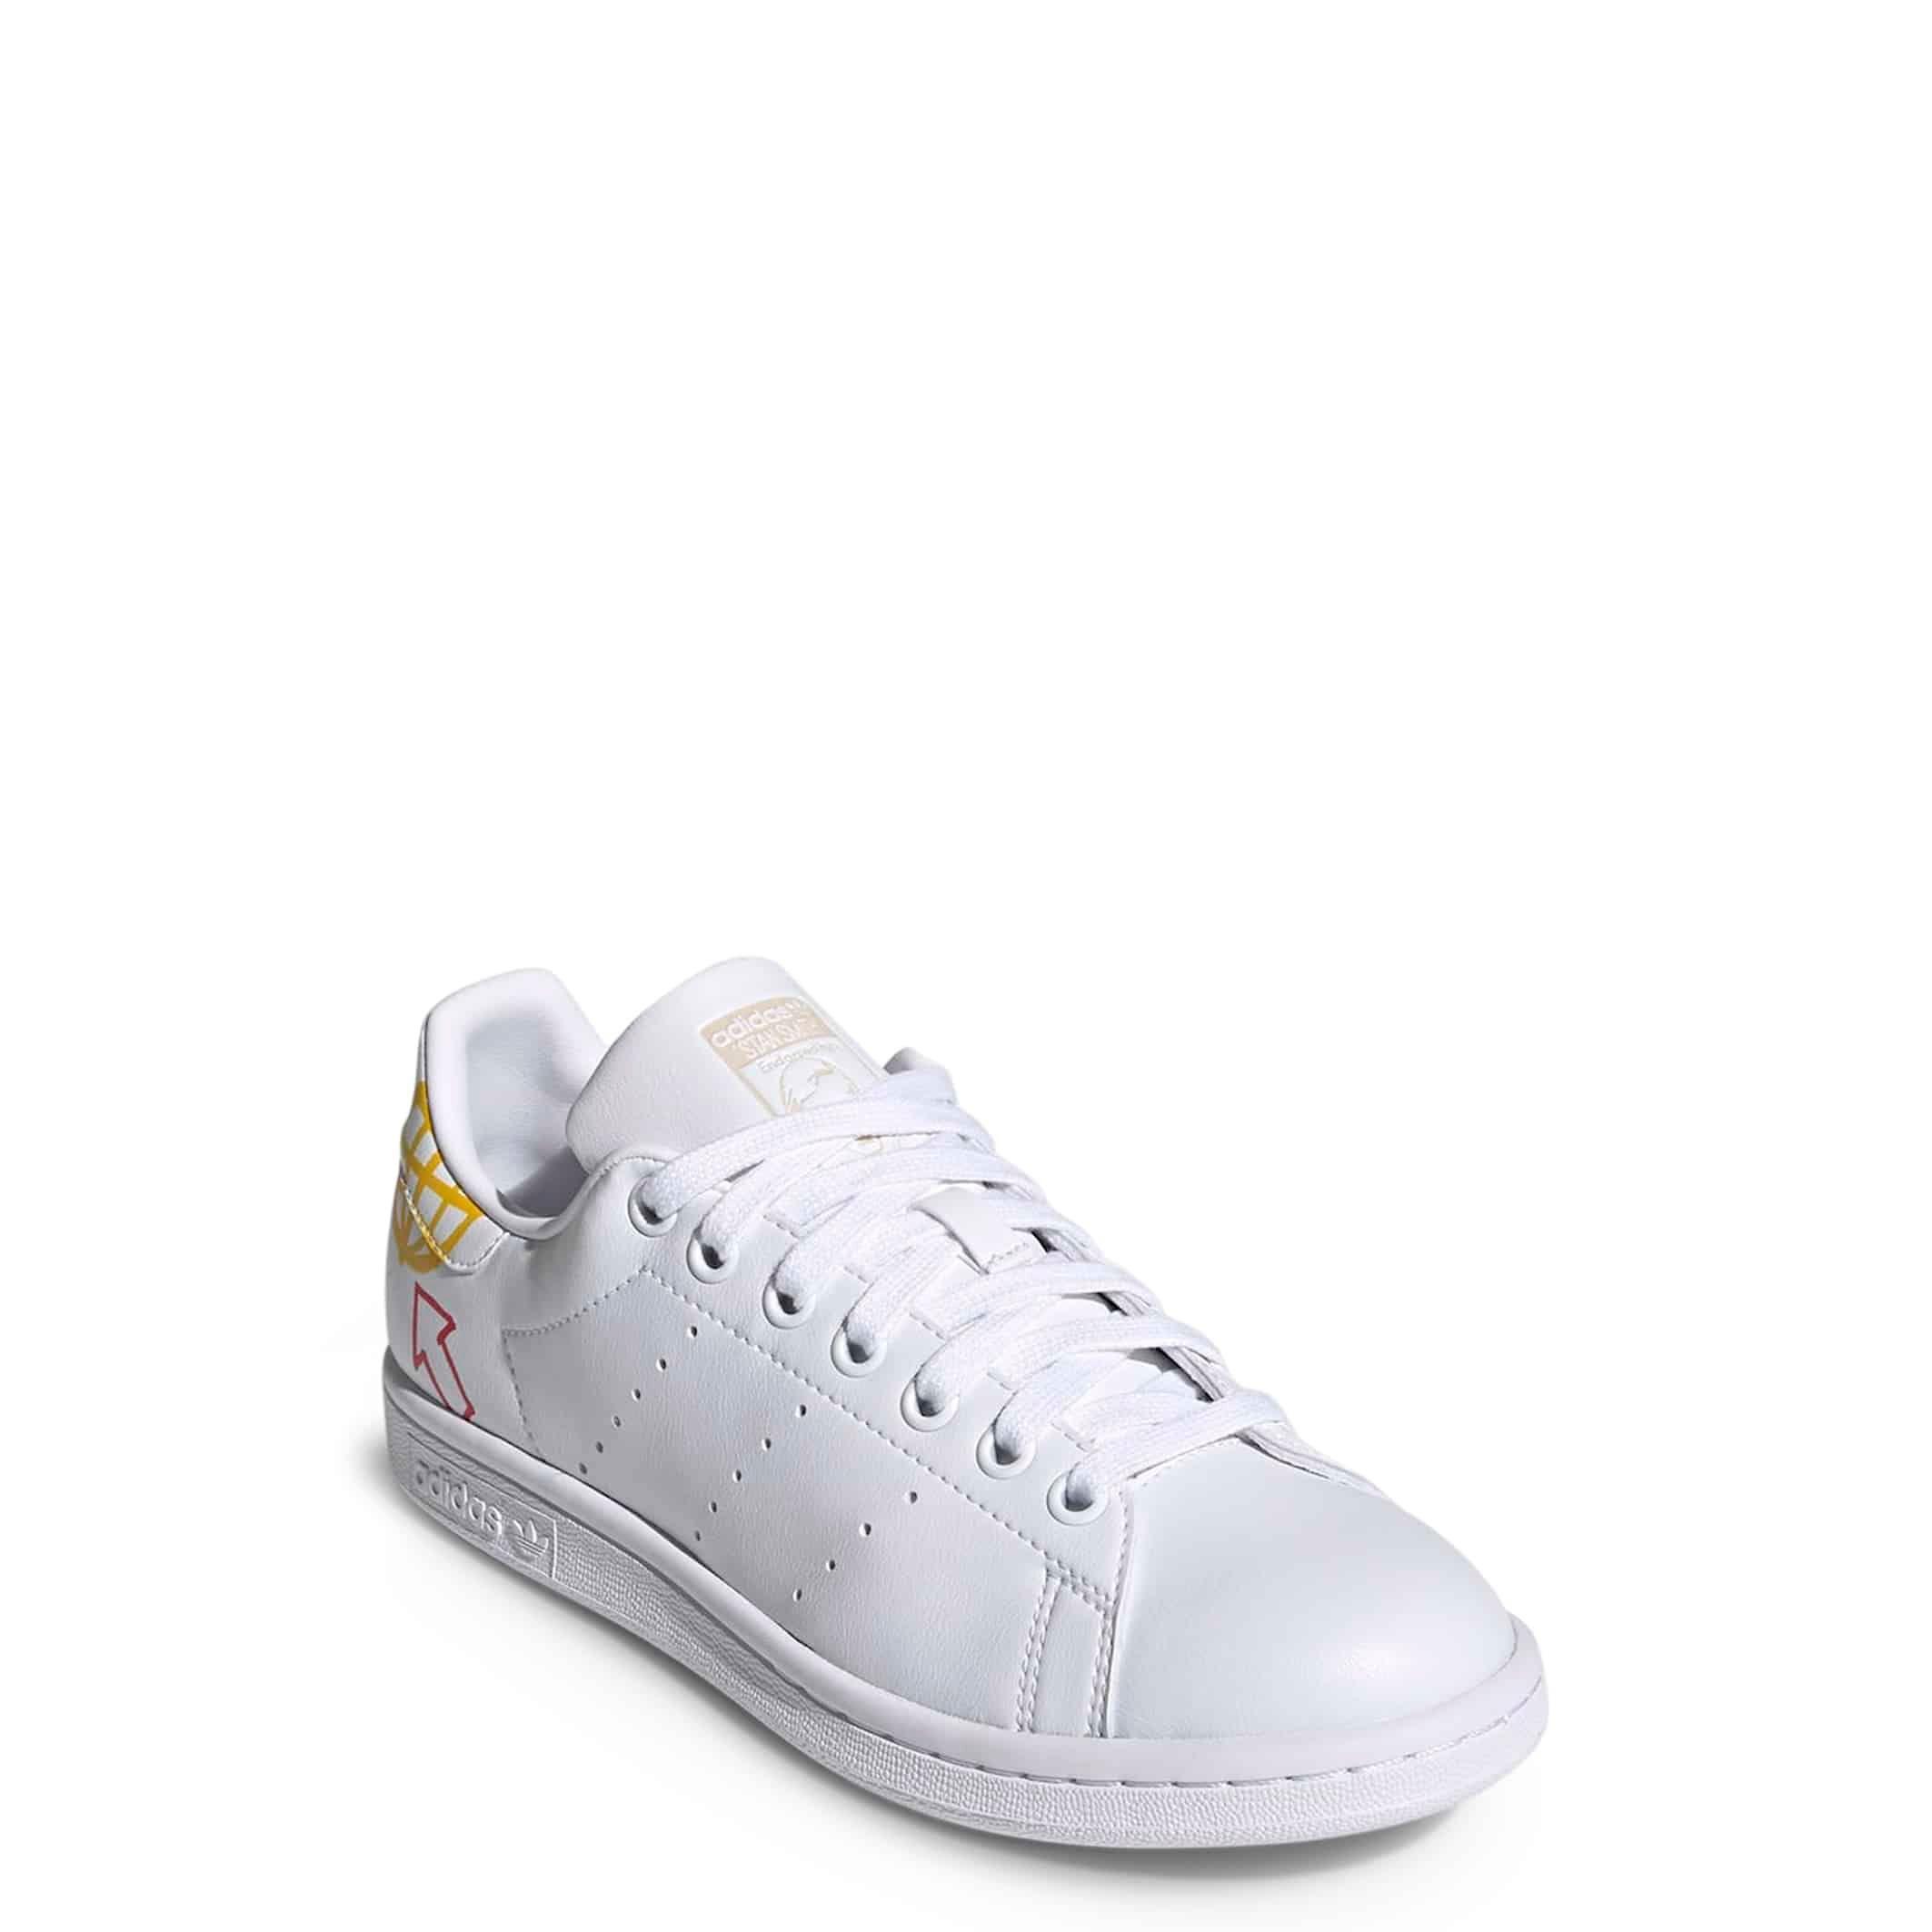 D5Bfb0F0 A8Ec 11Eb 8A9A F1C3E2Cbd2F6 Adidas - Stansmith - White